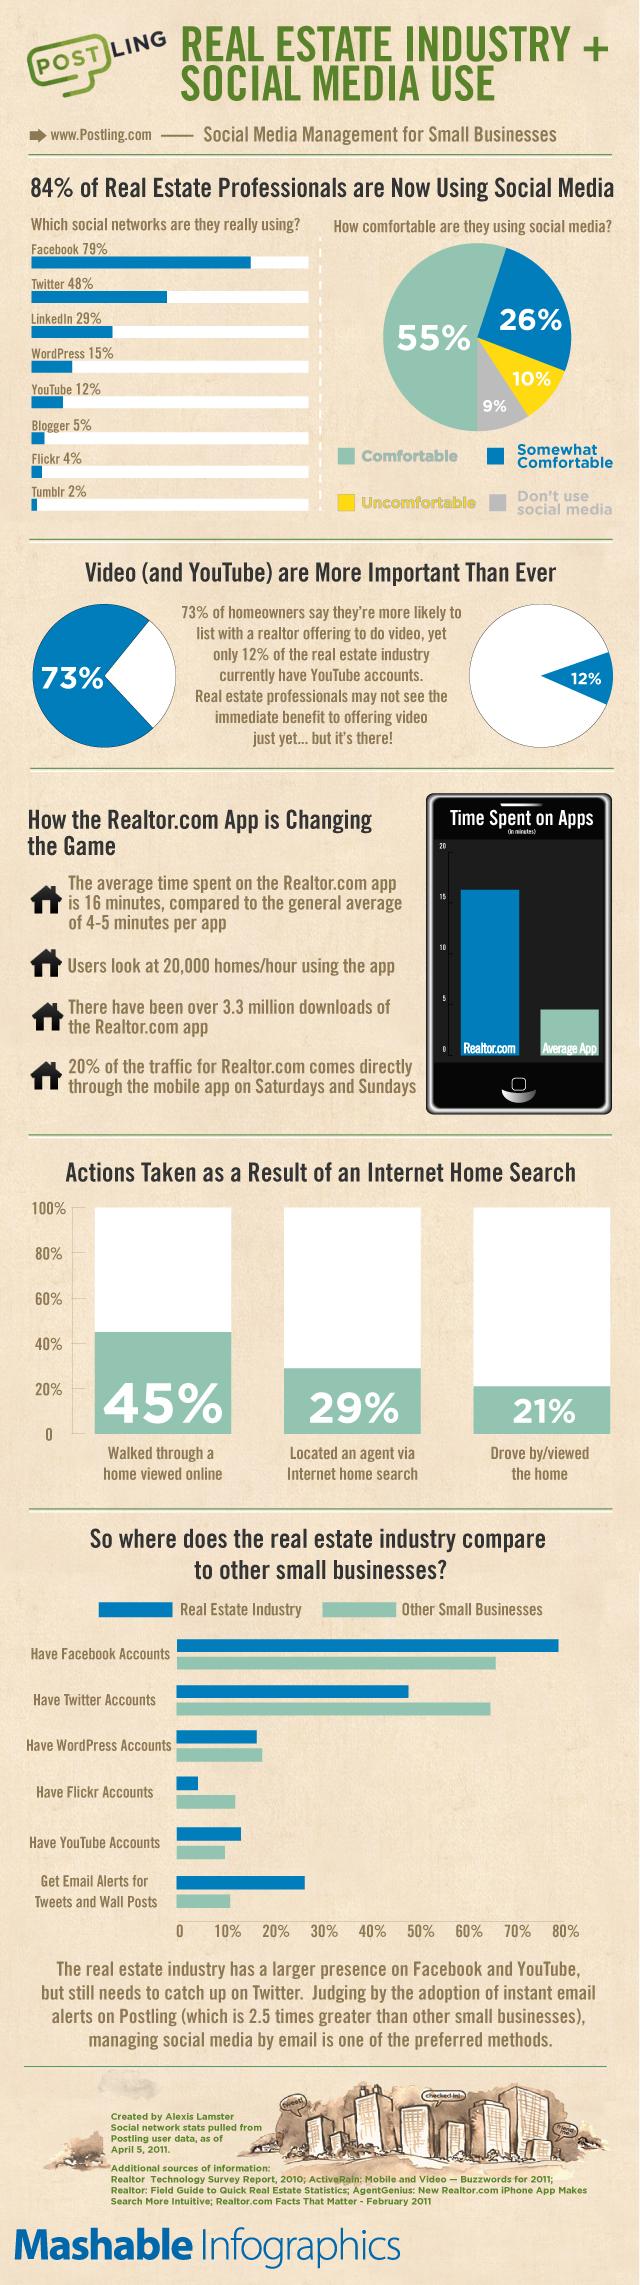 freshweb tech social media real estate